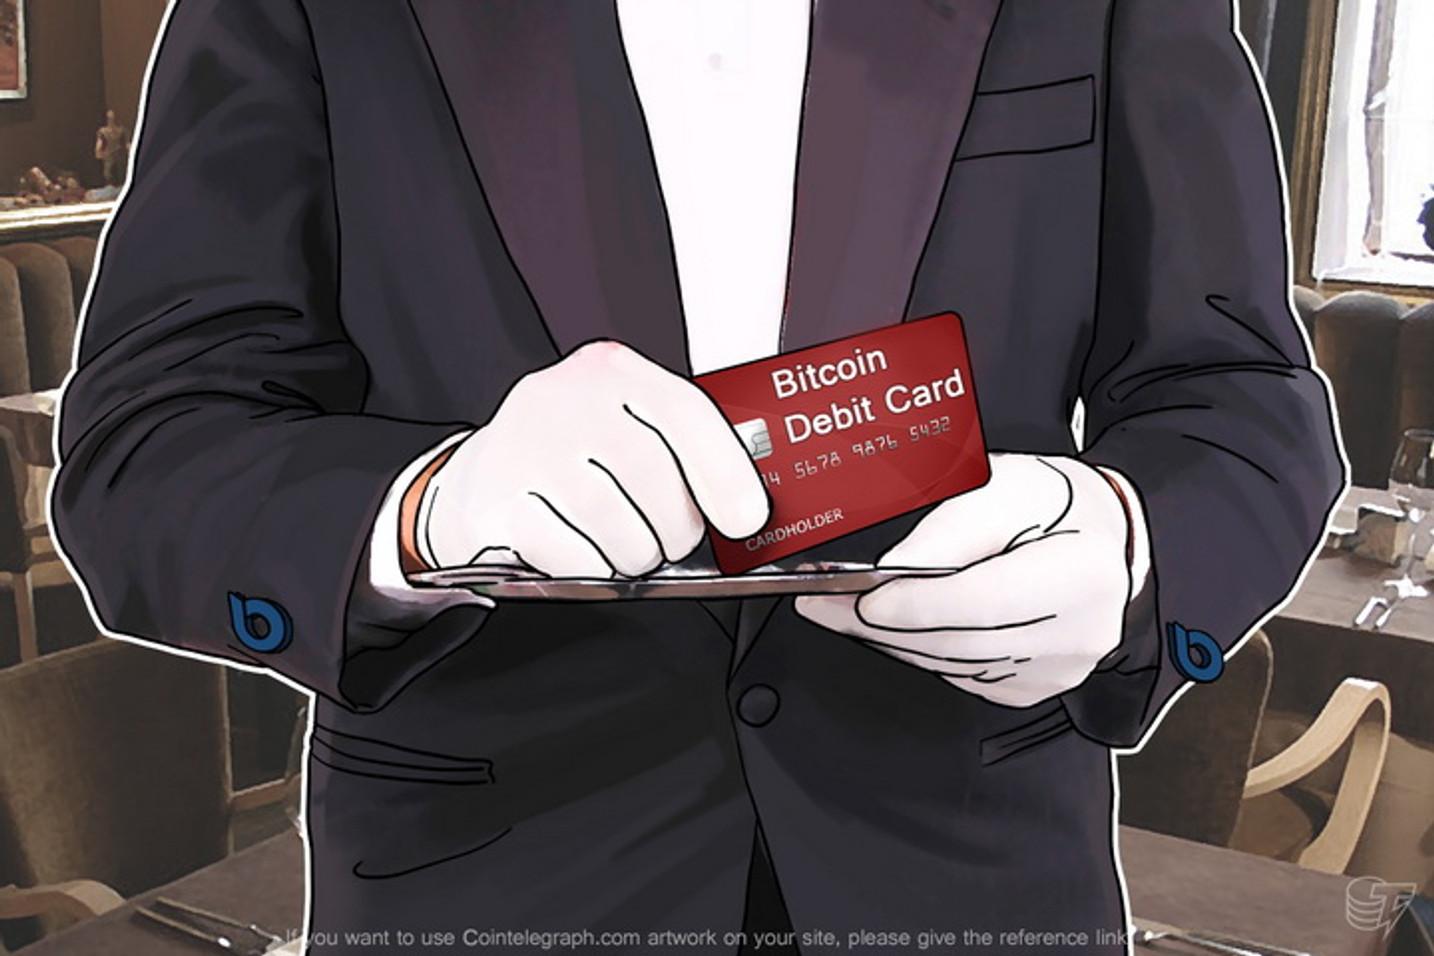 Bitwala Adds Debit Card to its Service Portfolio